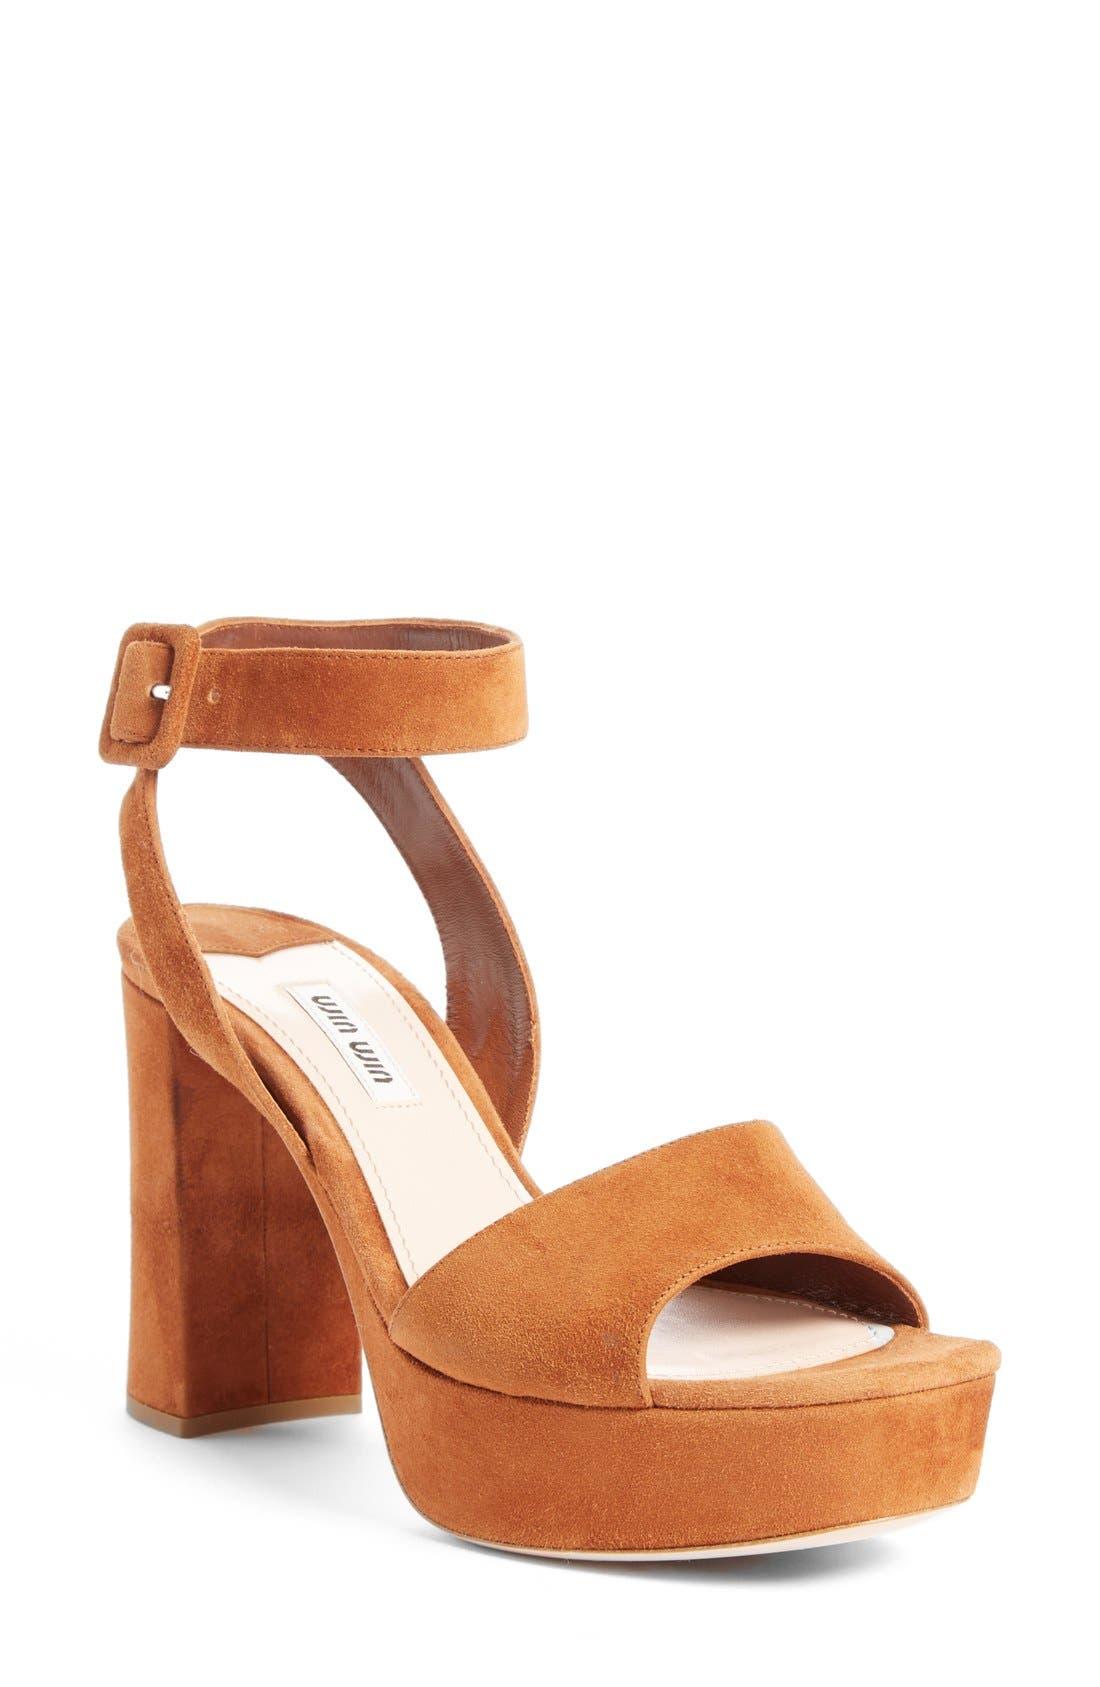 'Sandali' Ankle Strap Sandal,                         Main,                         color,